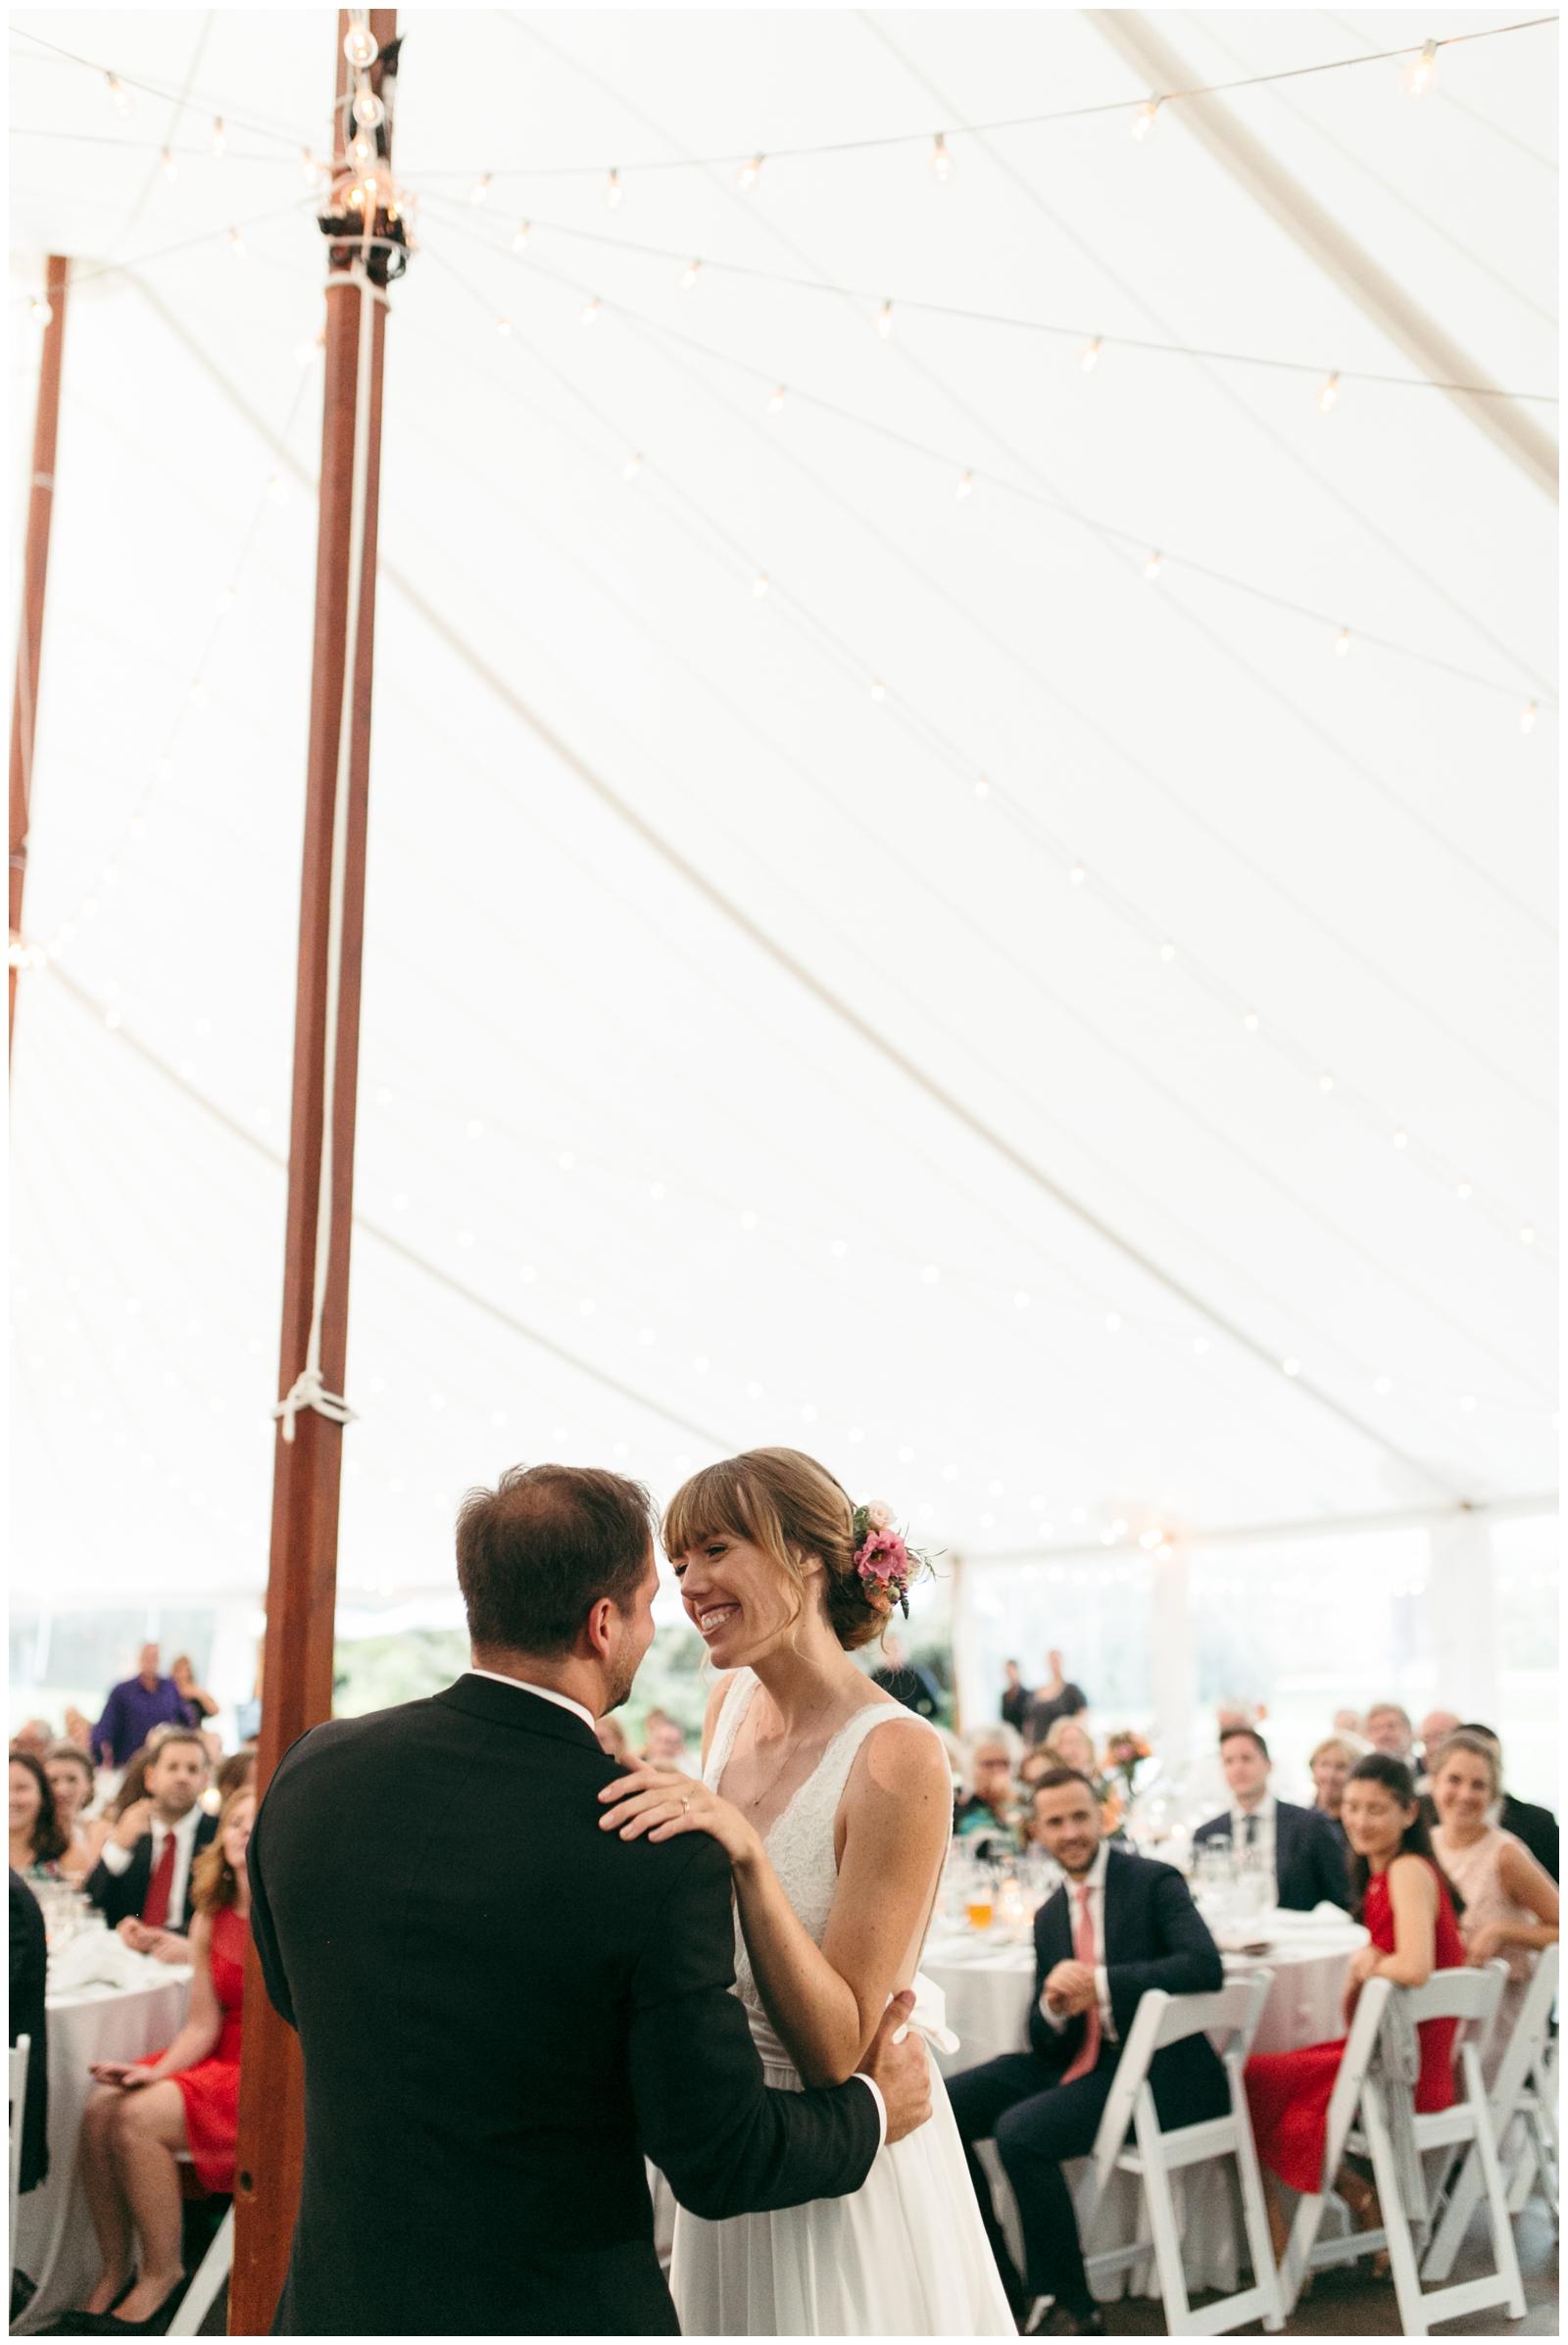 Moraine-Farm-wedding-Bailey-Q-Photo-Massachusetts-wedding-photpgrapher-119.jpg